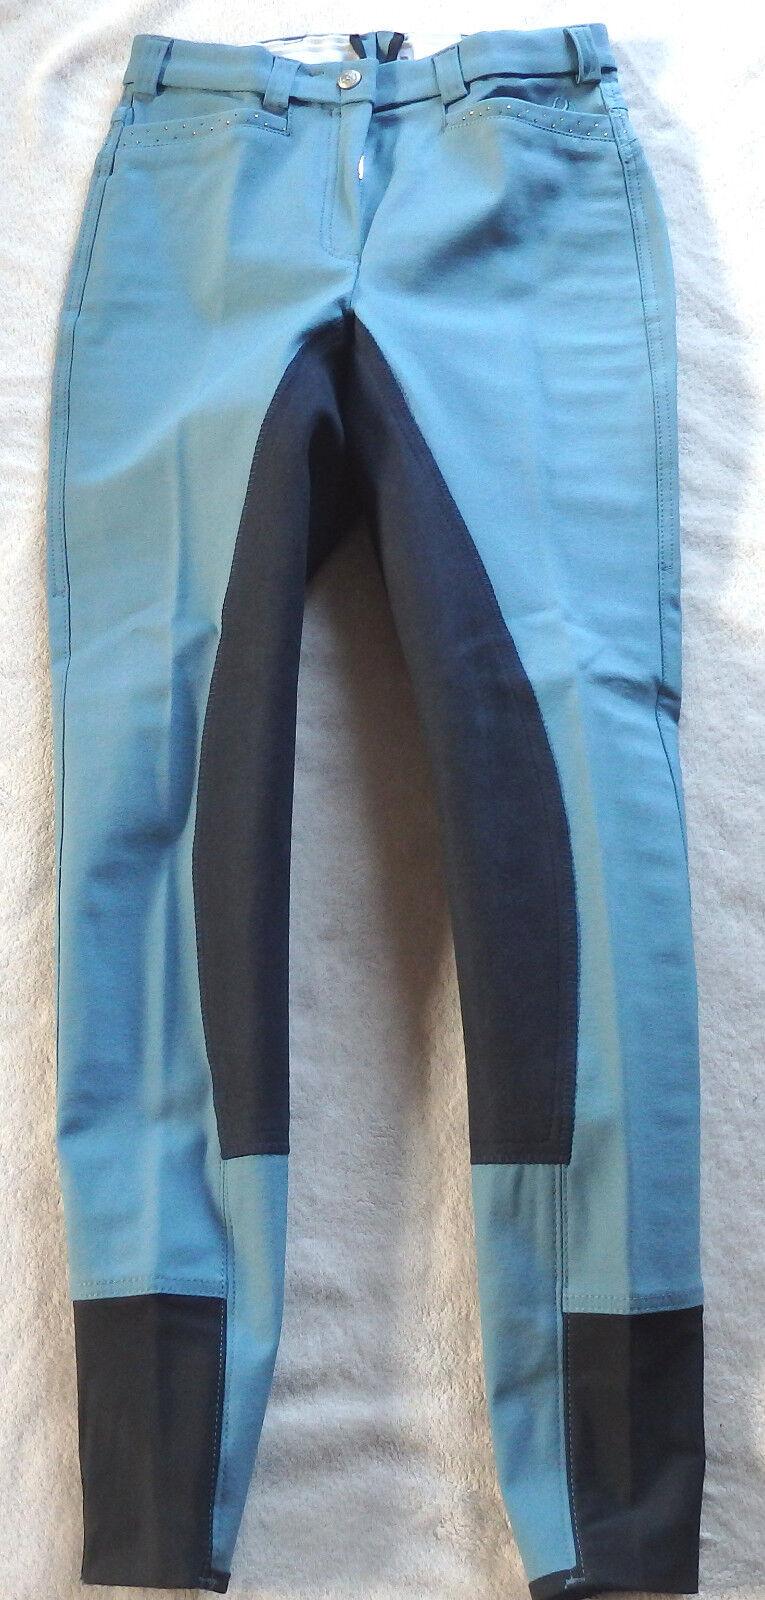 Señora reithose, 3 4 ribete de pleno, azul, baroux, brillo, PVP  (59)